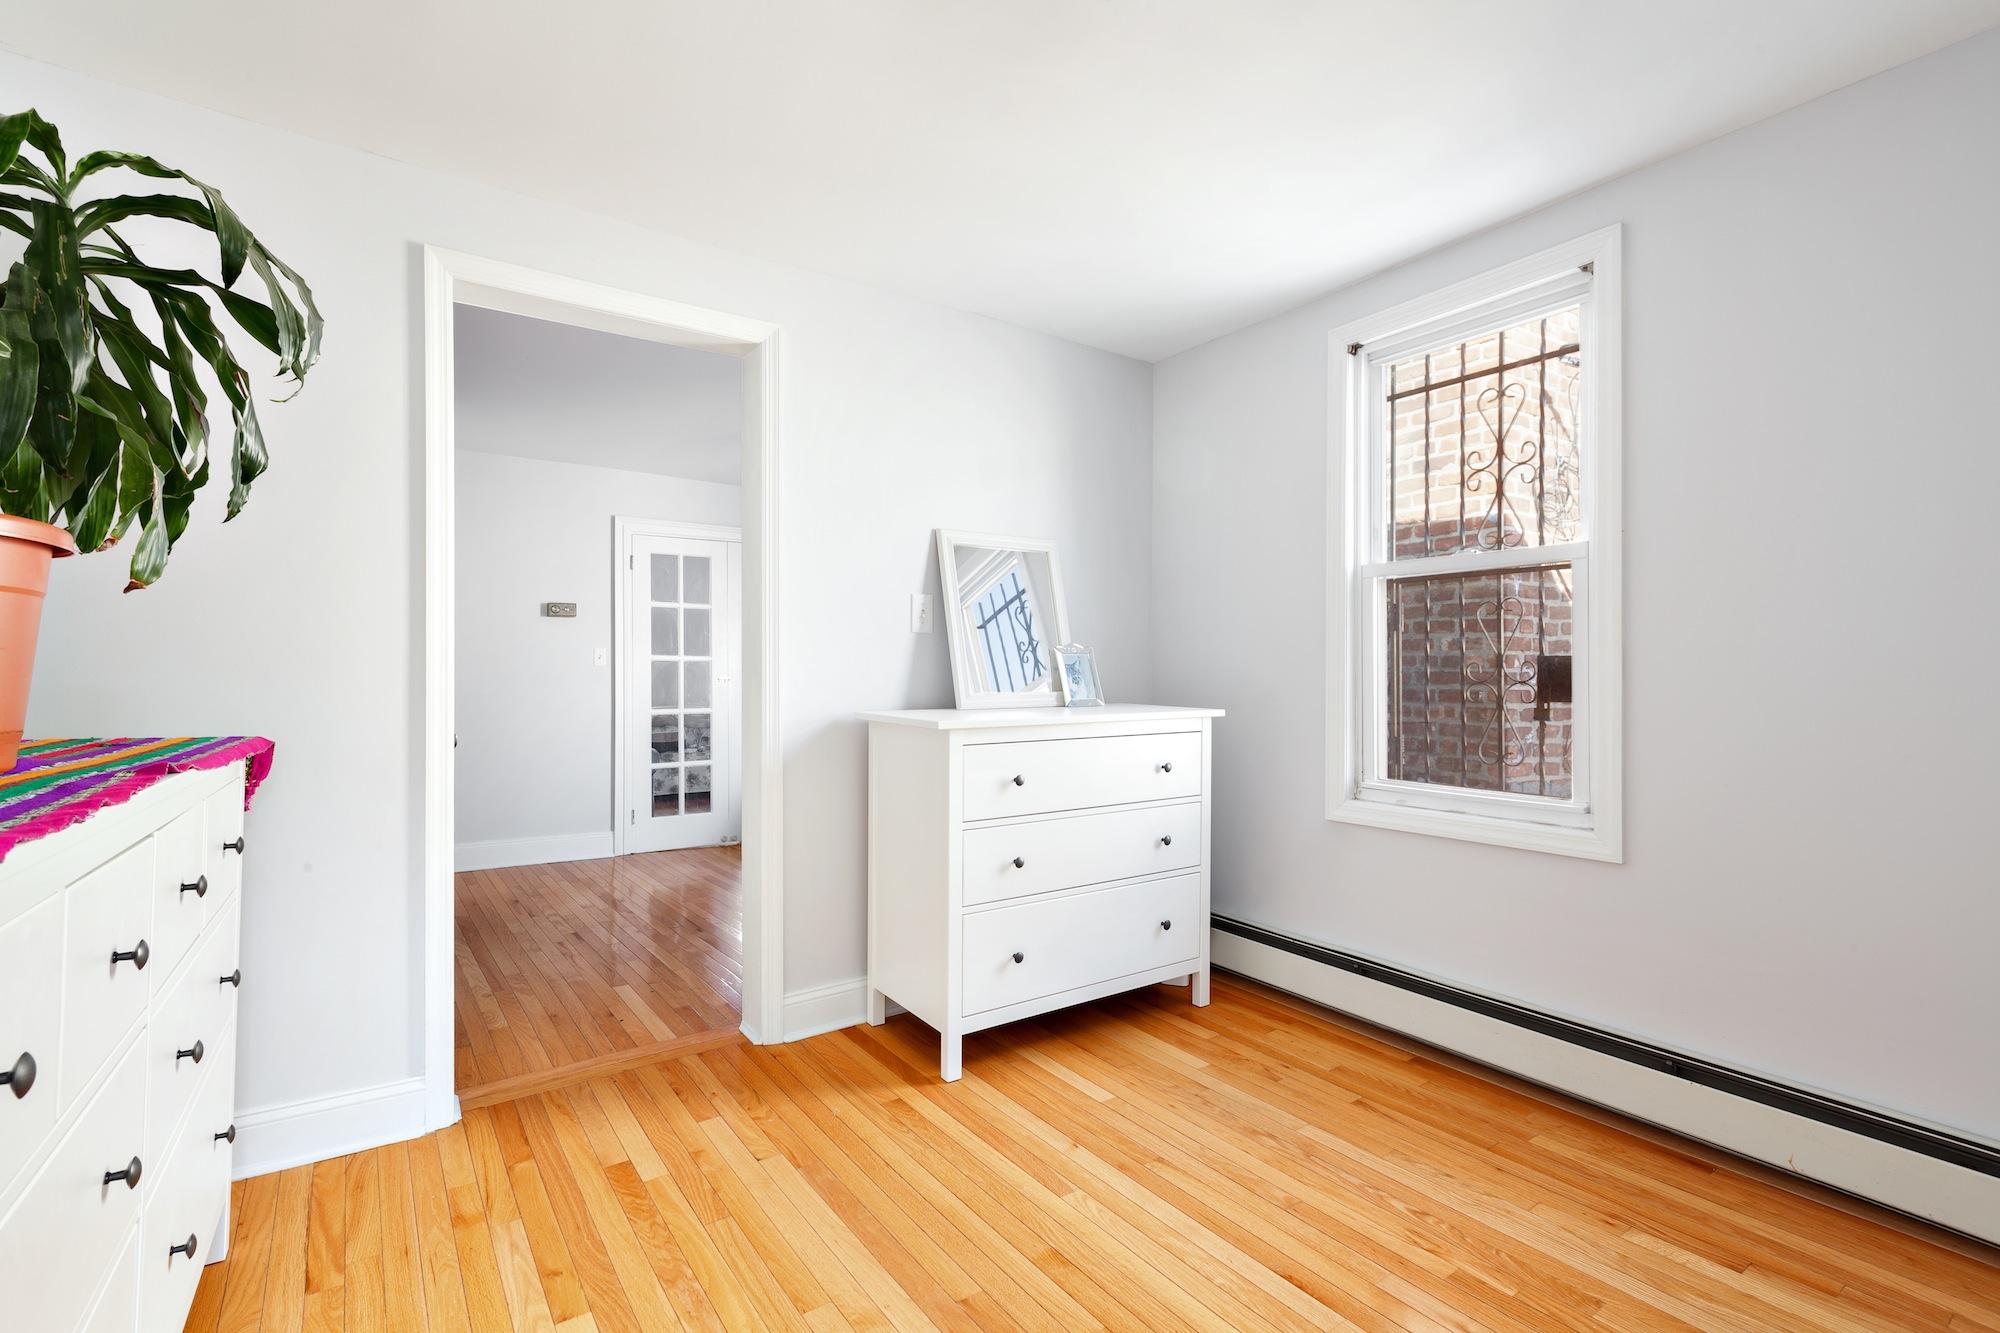 136 30th Street, bedroom, shotgun house